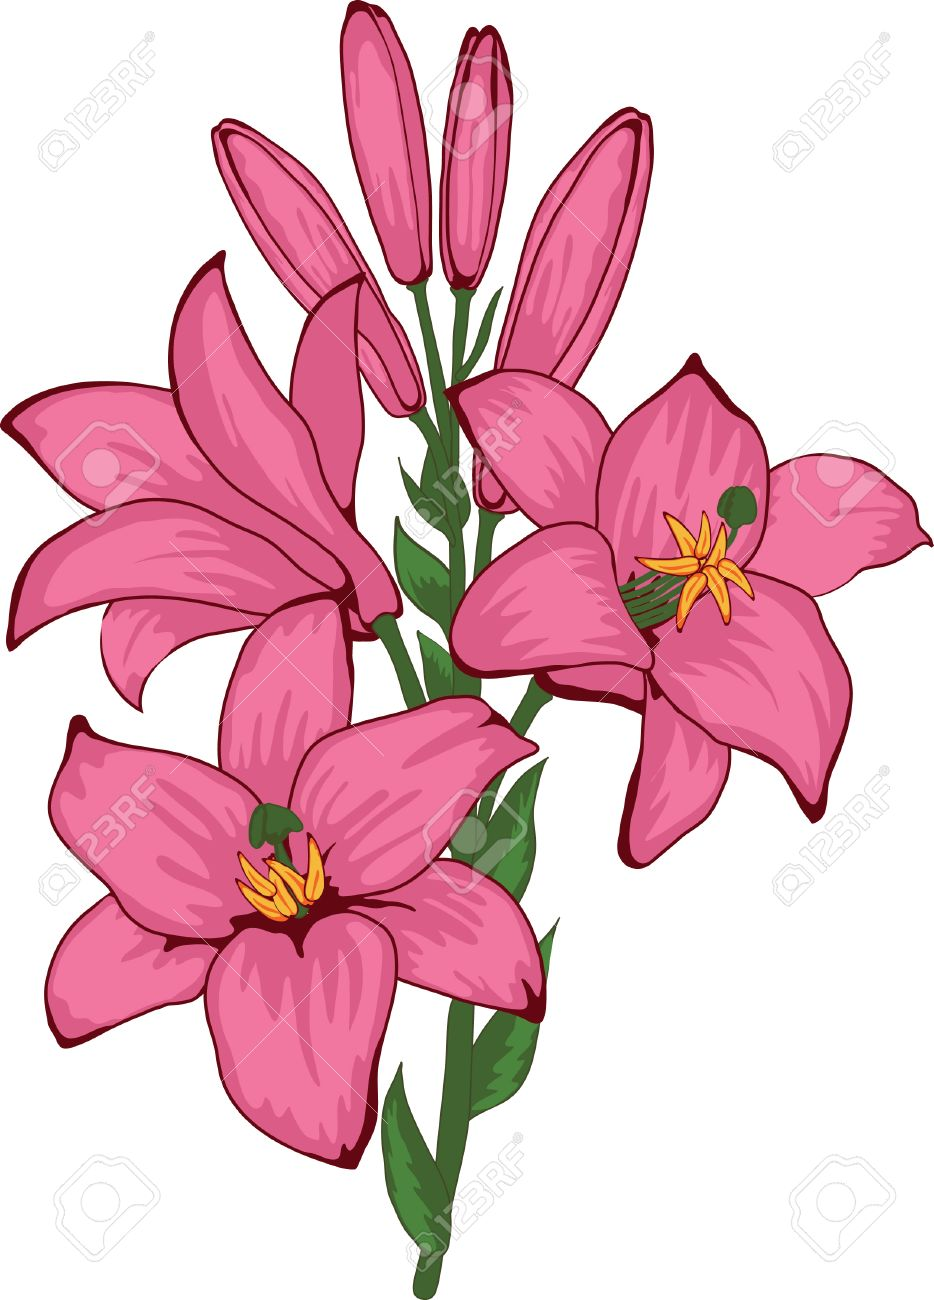 Flower a lily element for design illustration royalty free flower a lily element for design illustration stock vector 8783336 dhlflorist Images